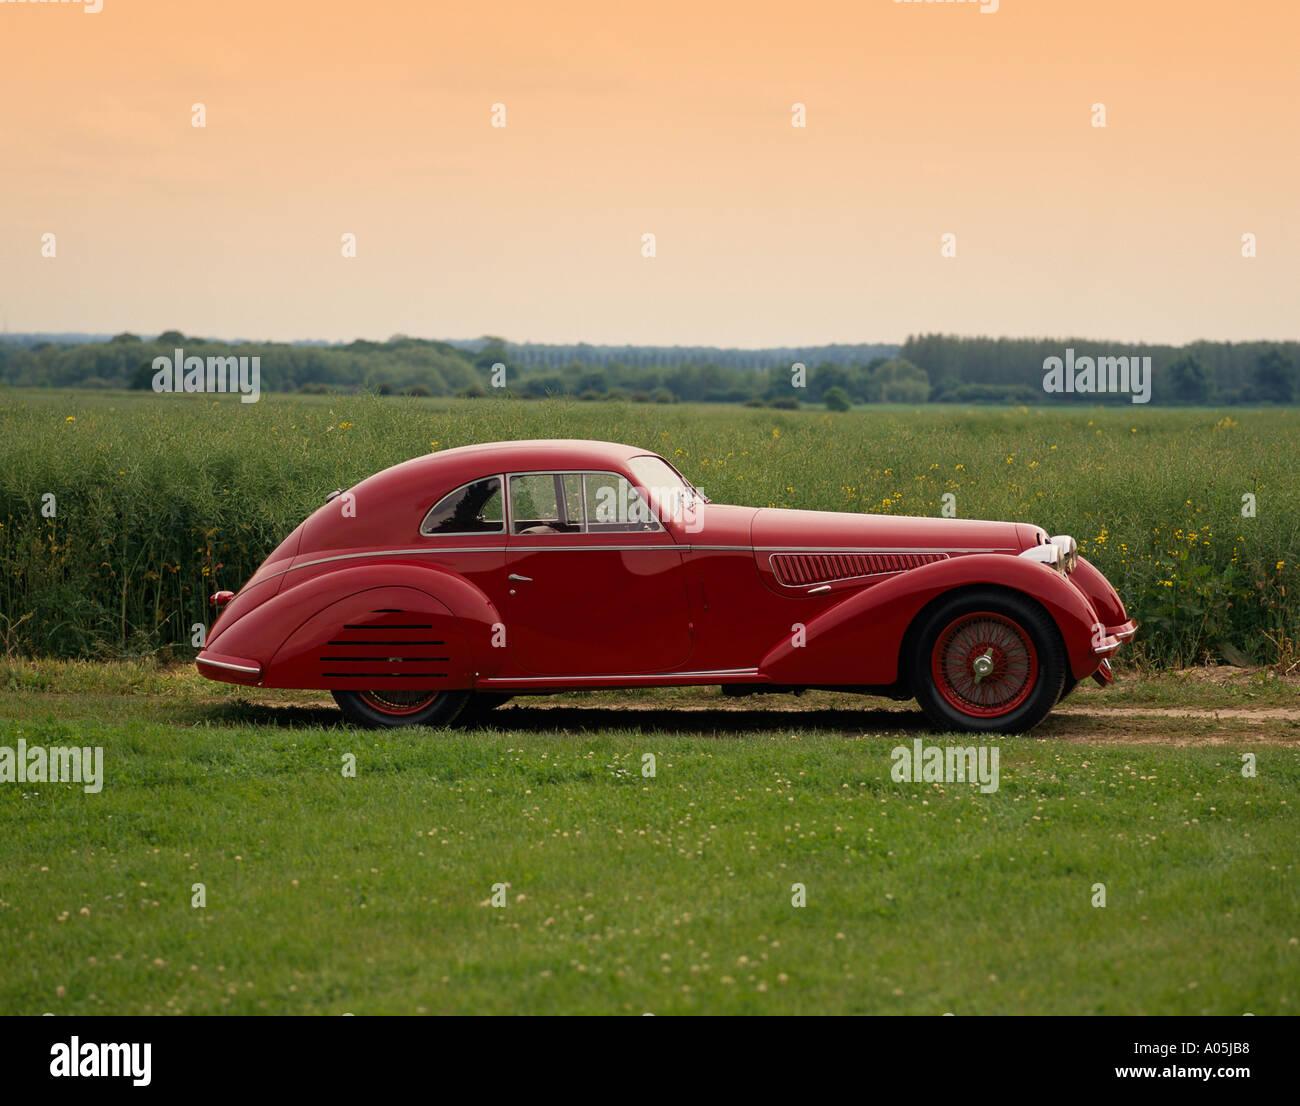 1939 Alfa Romeo 8C 2900B Lungo Berlinetta 3 0 Litre